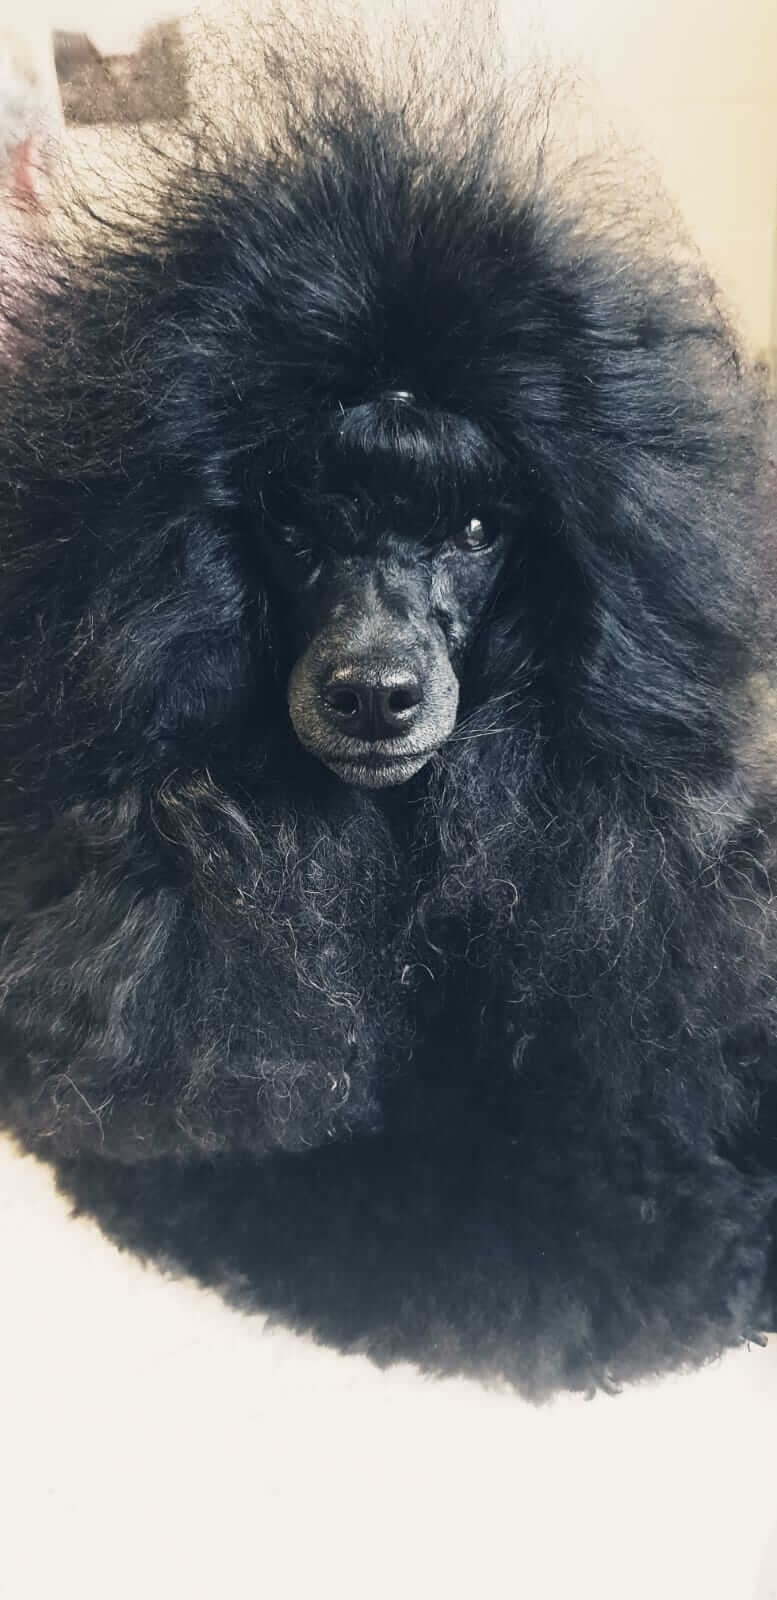 Freshly groomed Poodle